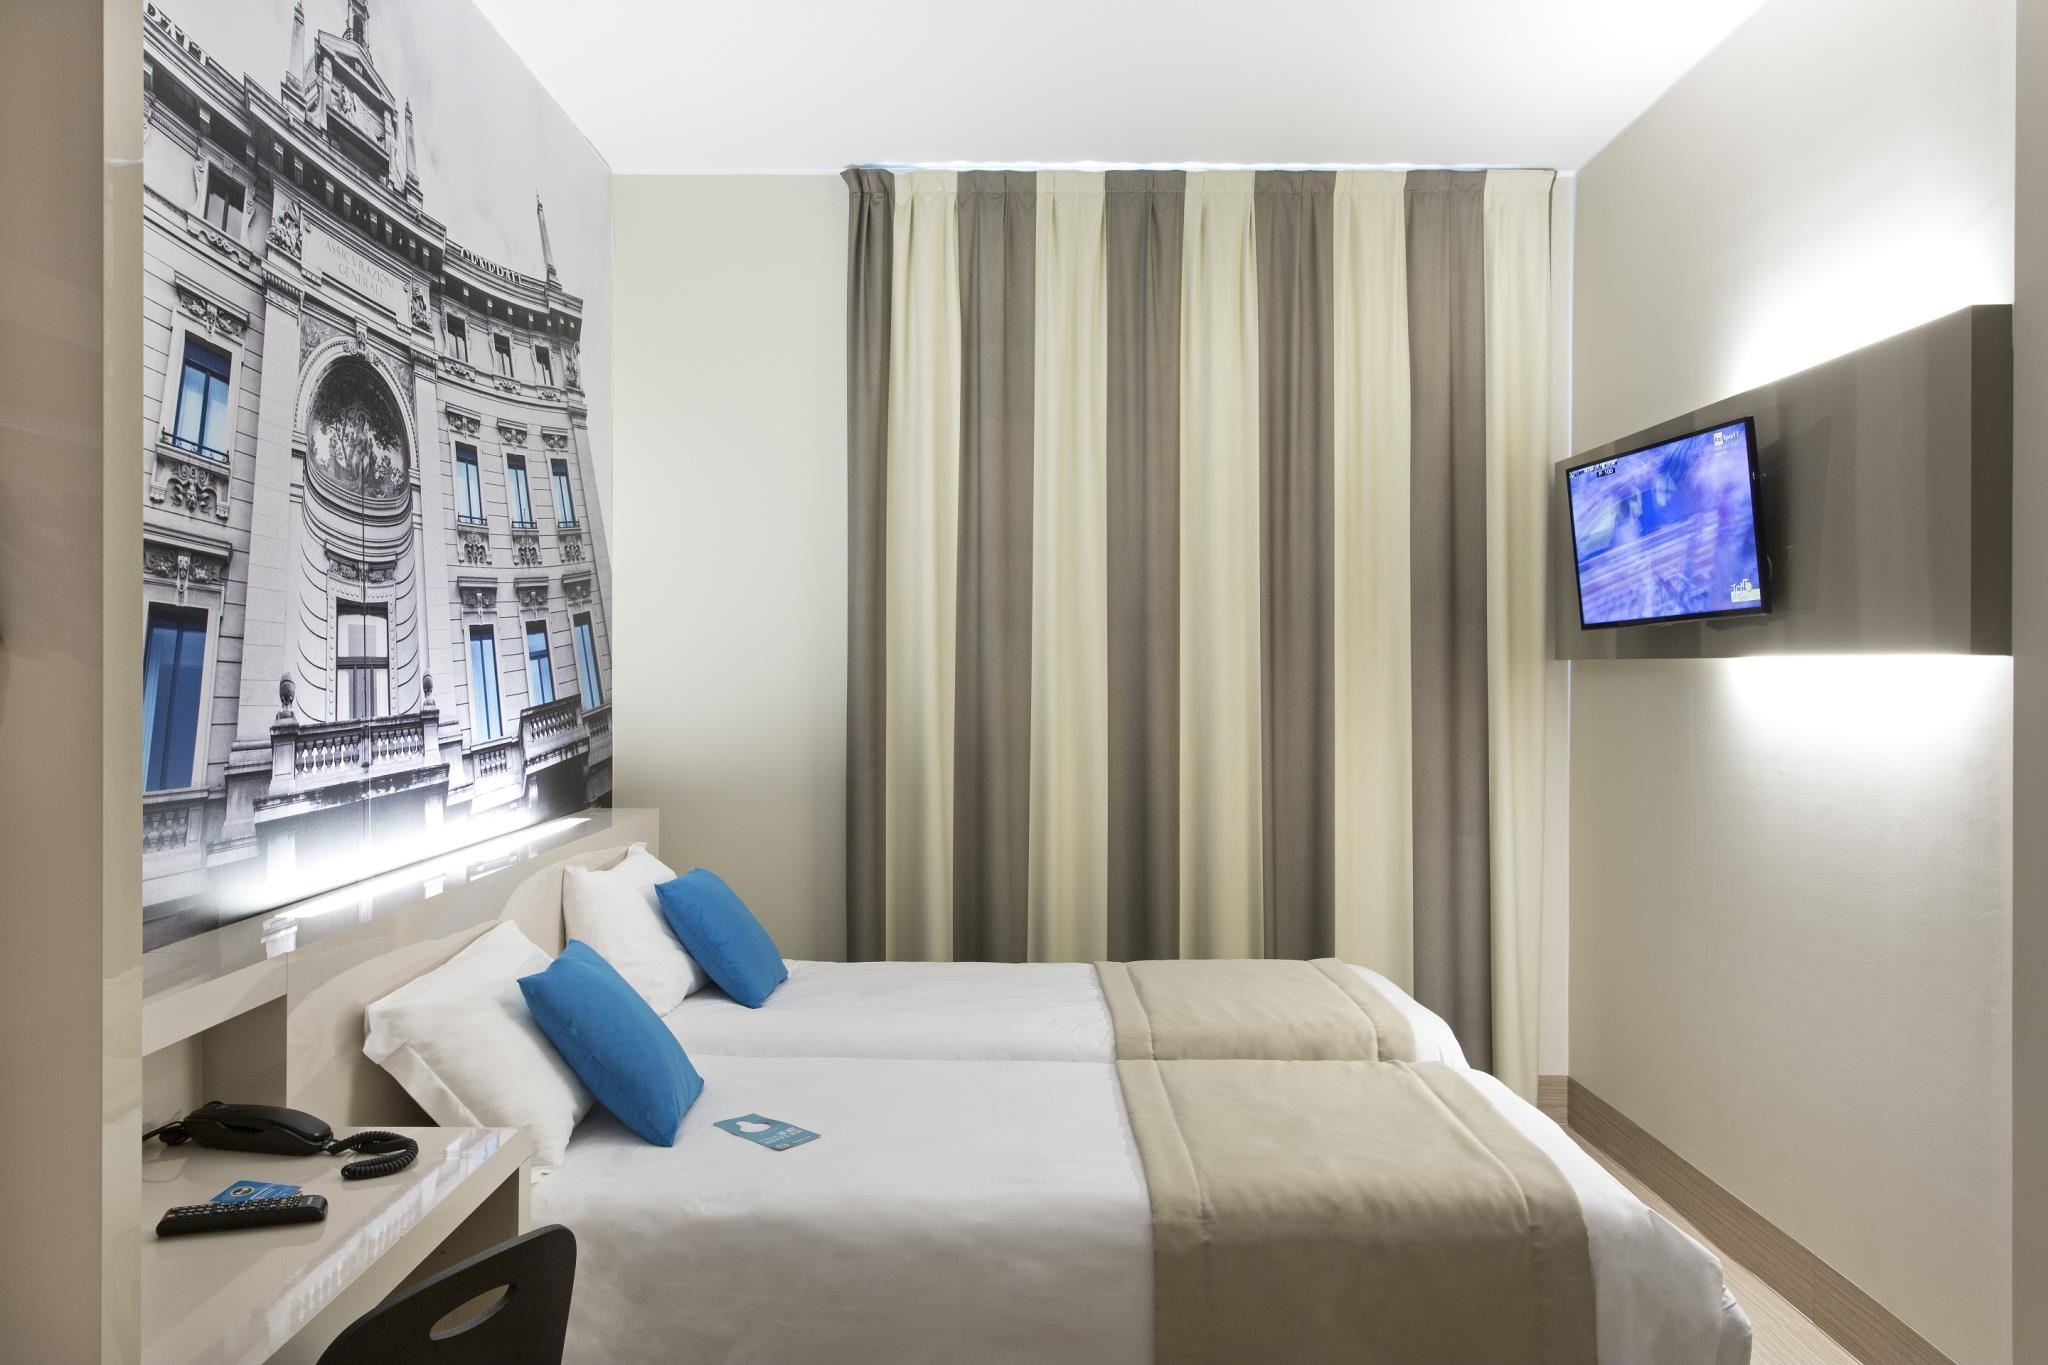 B&b Corso Sempione Milano b&b hotel milano san siro in italy - room deals, photos